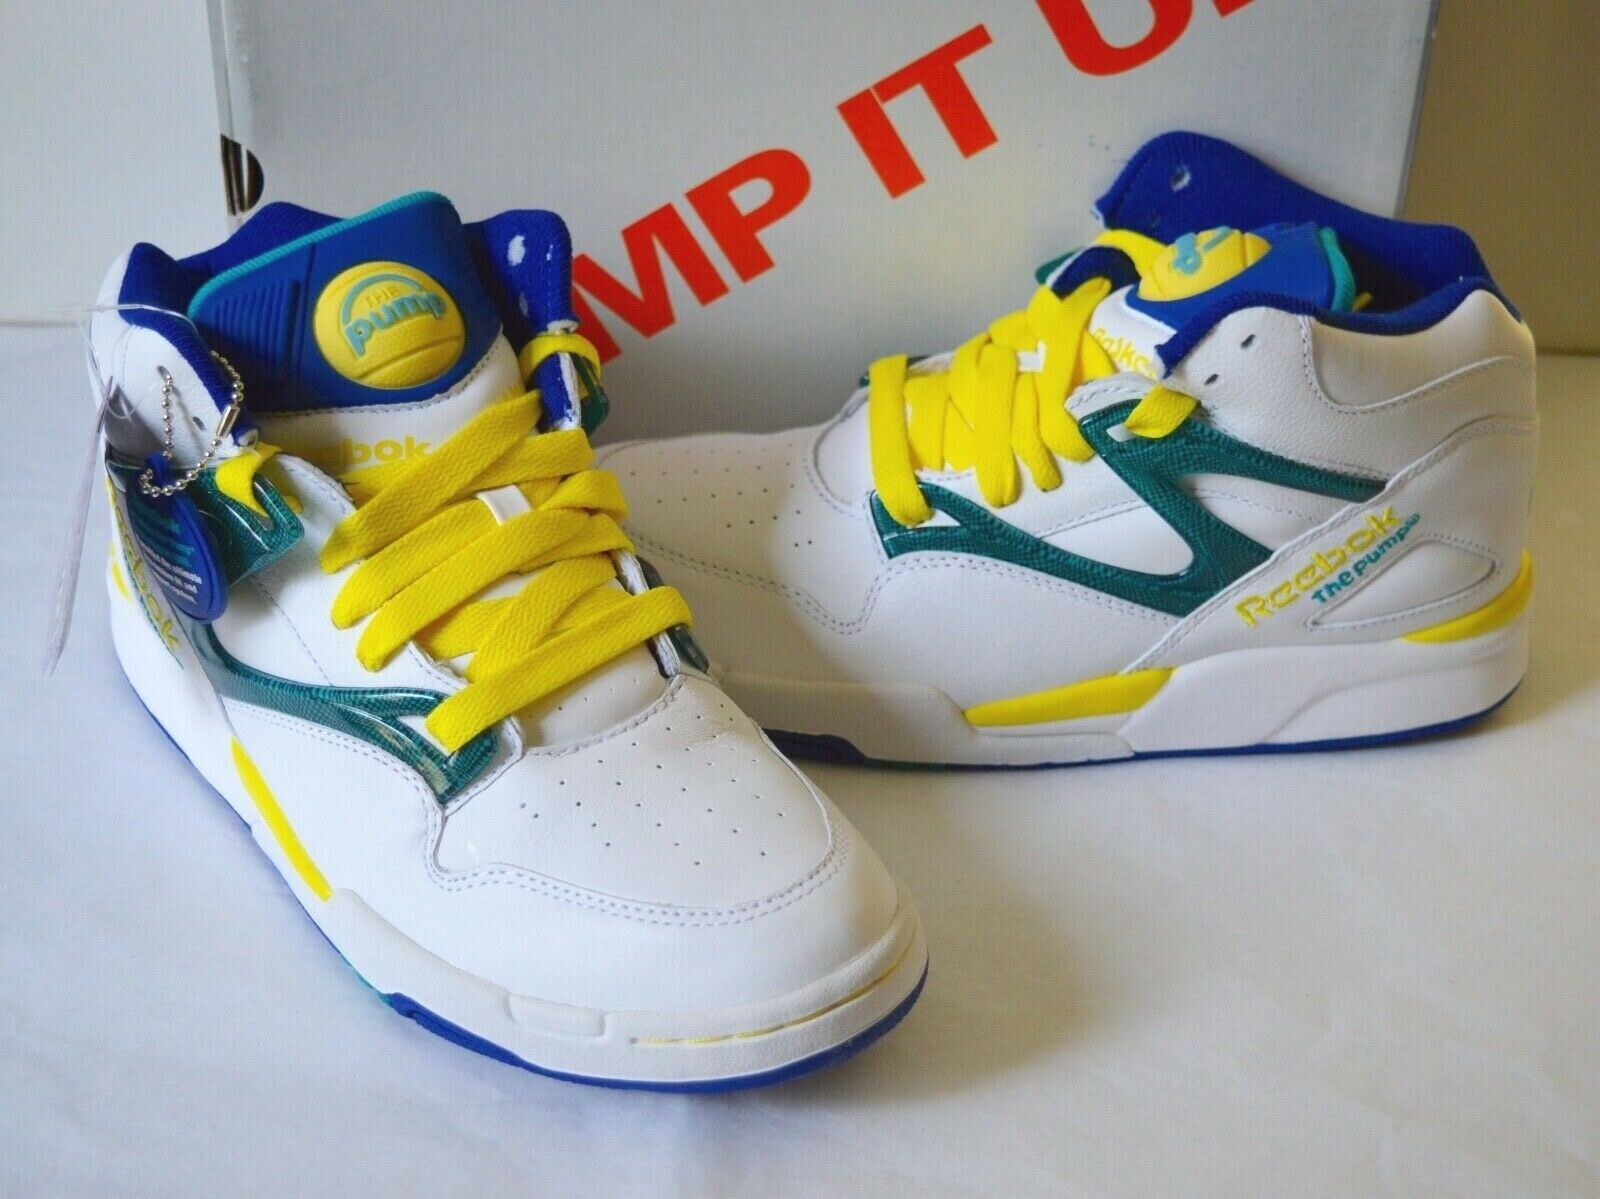 New Reebok Pump Omni Lite  oroen State Warriors bianca Royal blu giallo 8 RARE